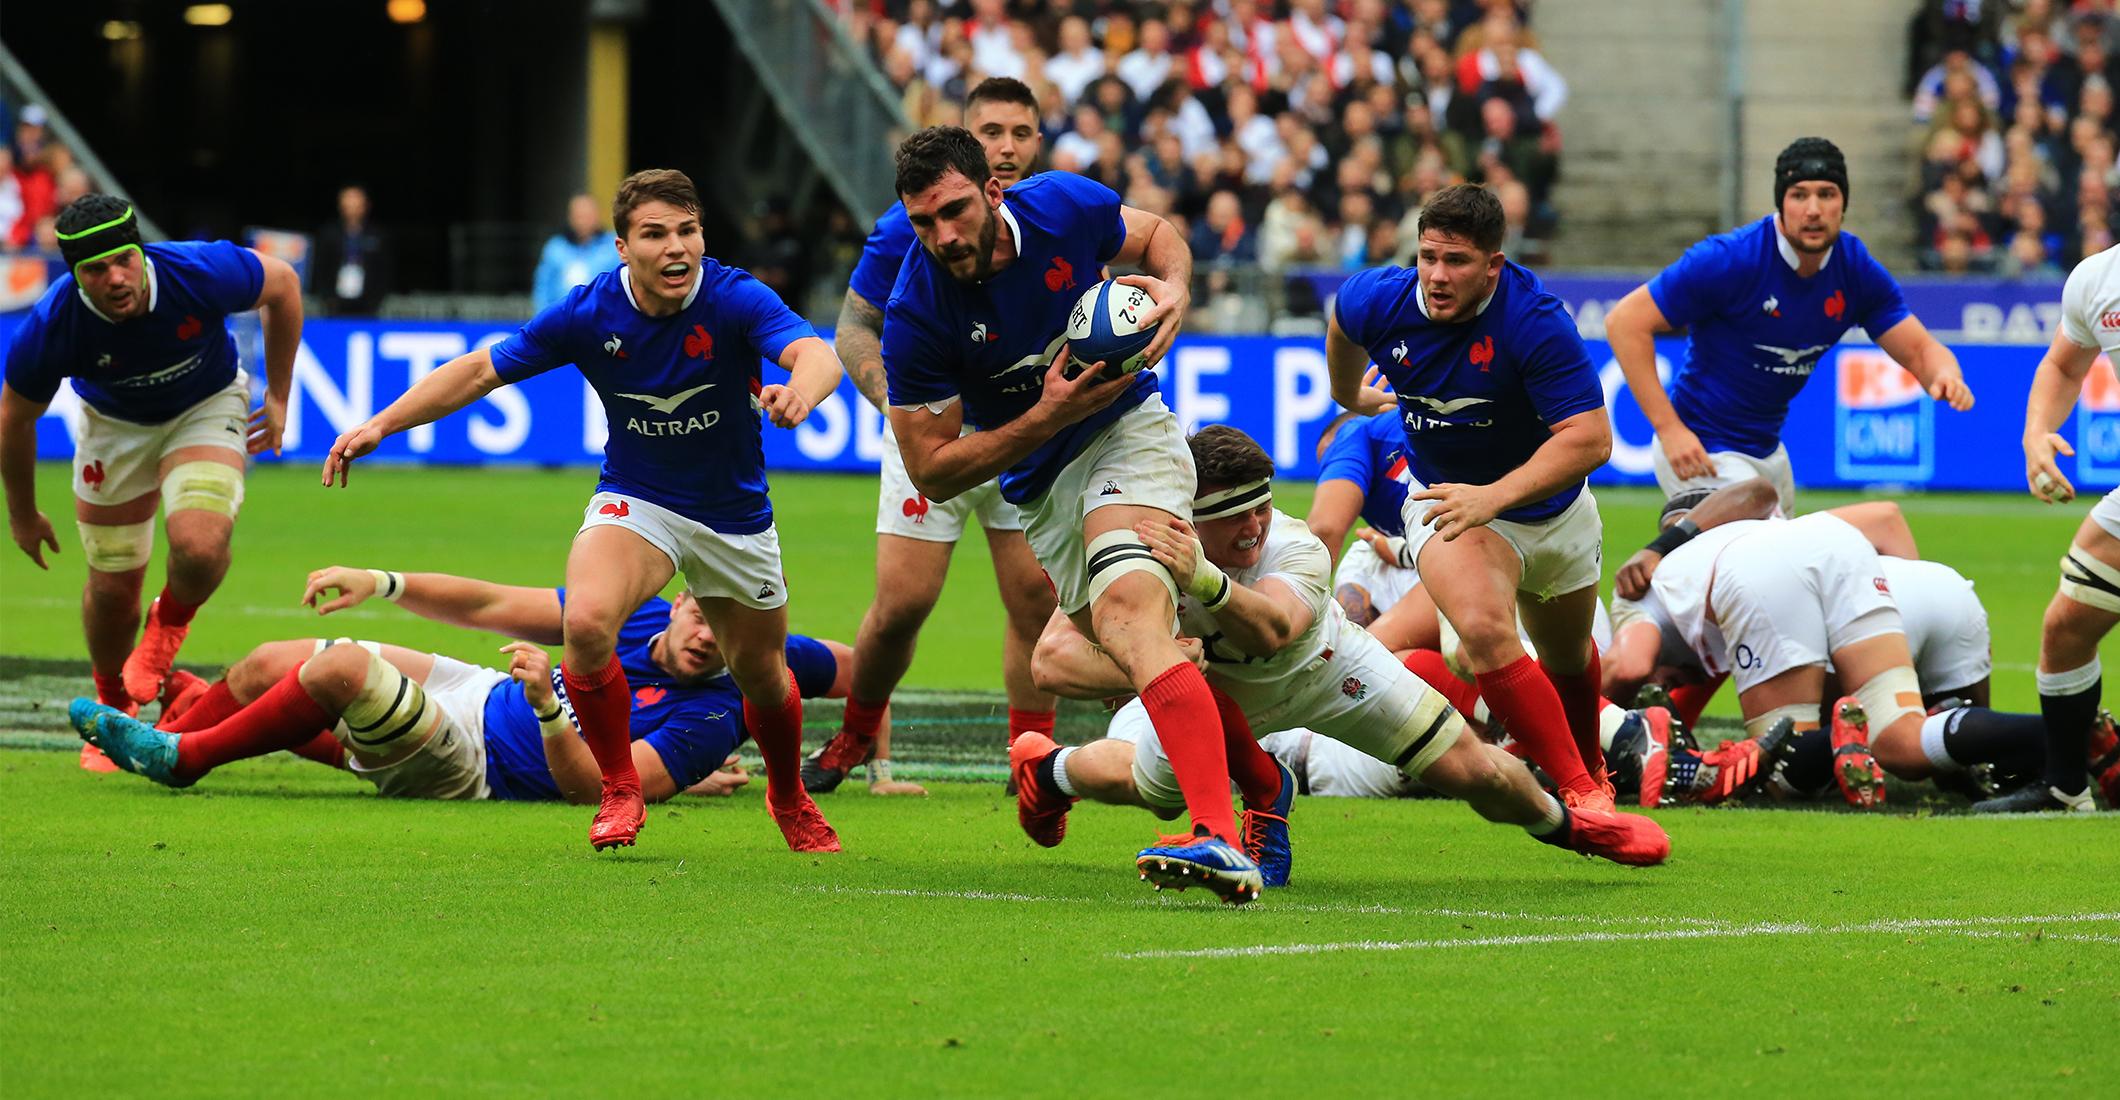 Tournoi-6-nations-Angleterre-France